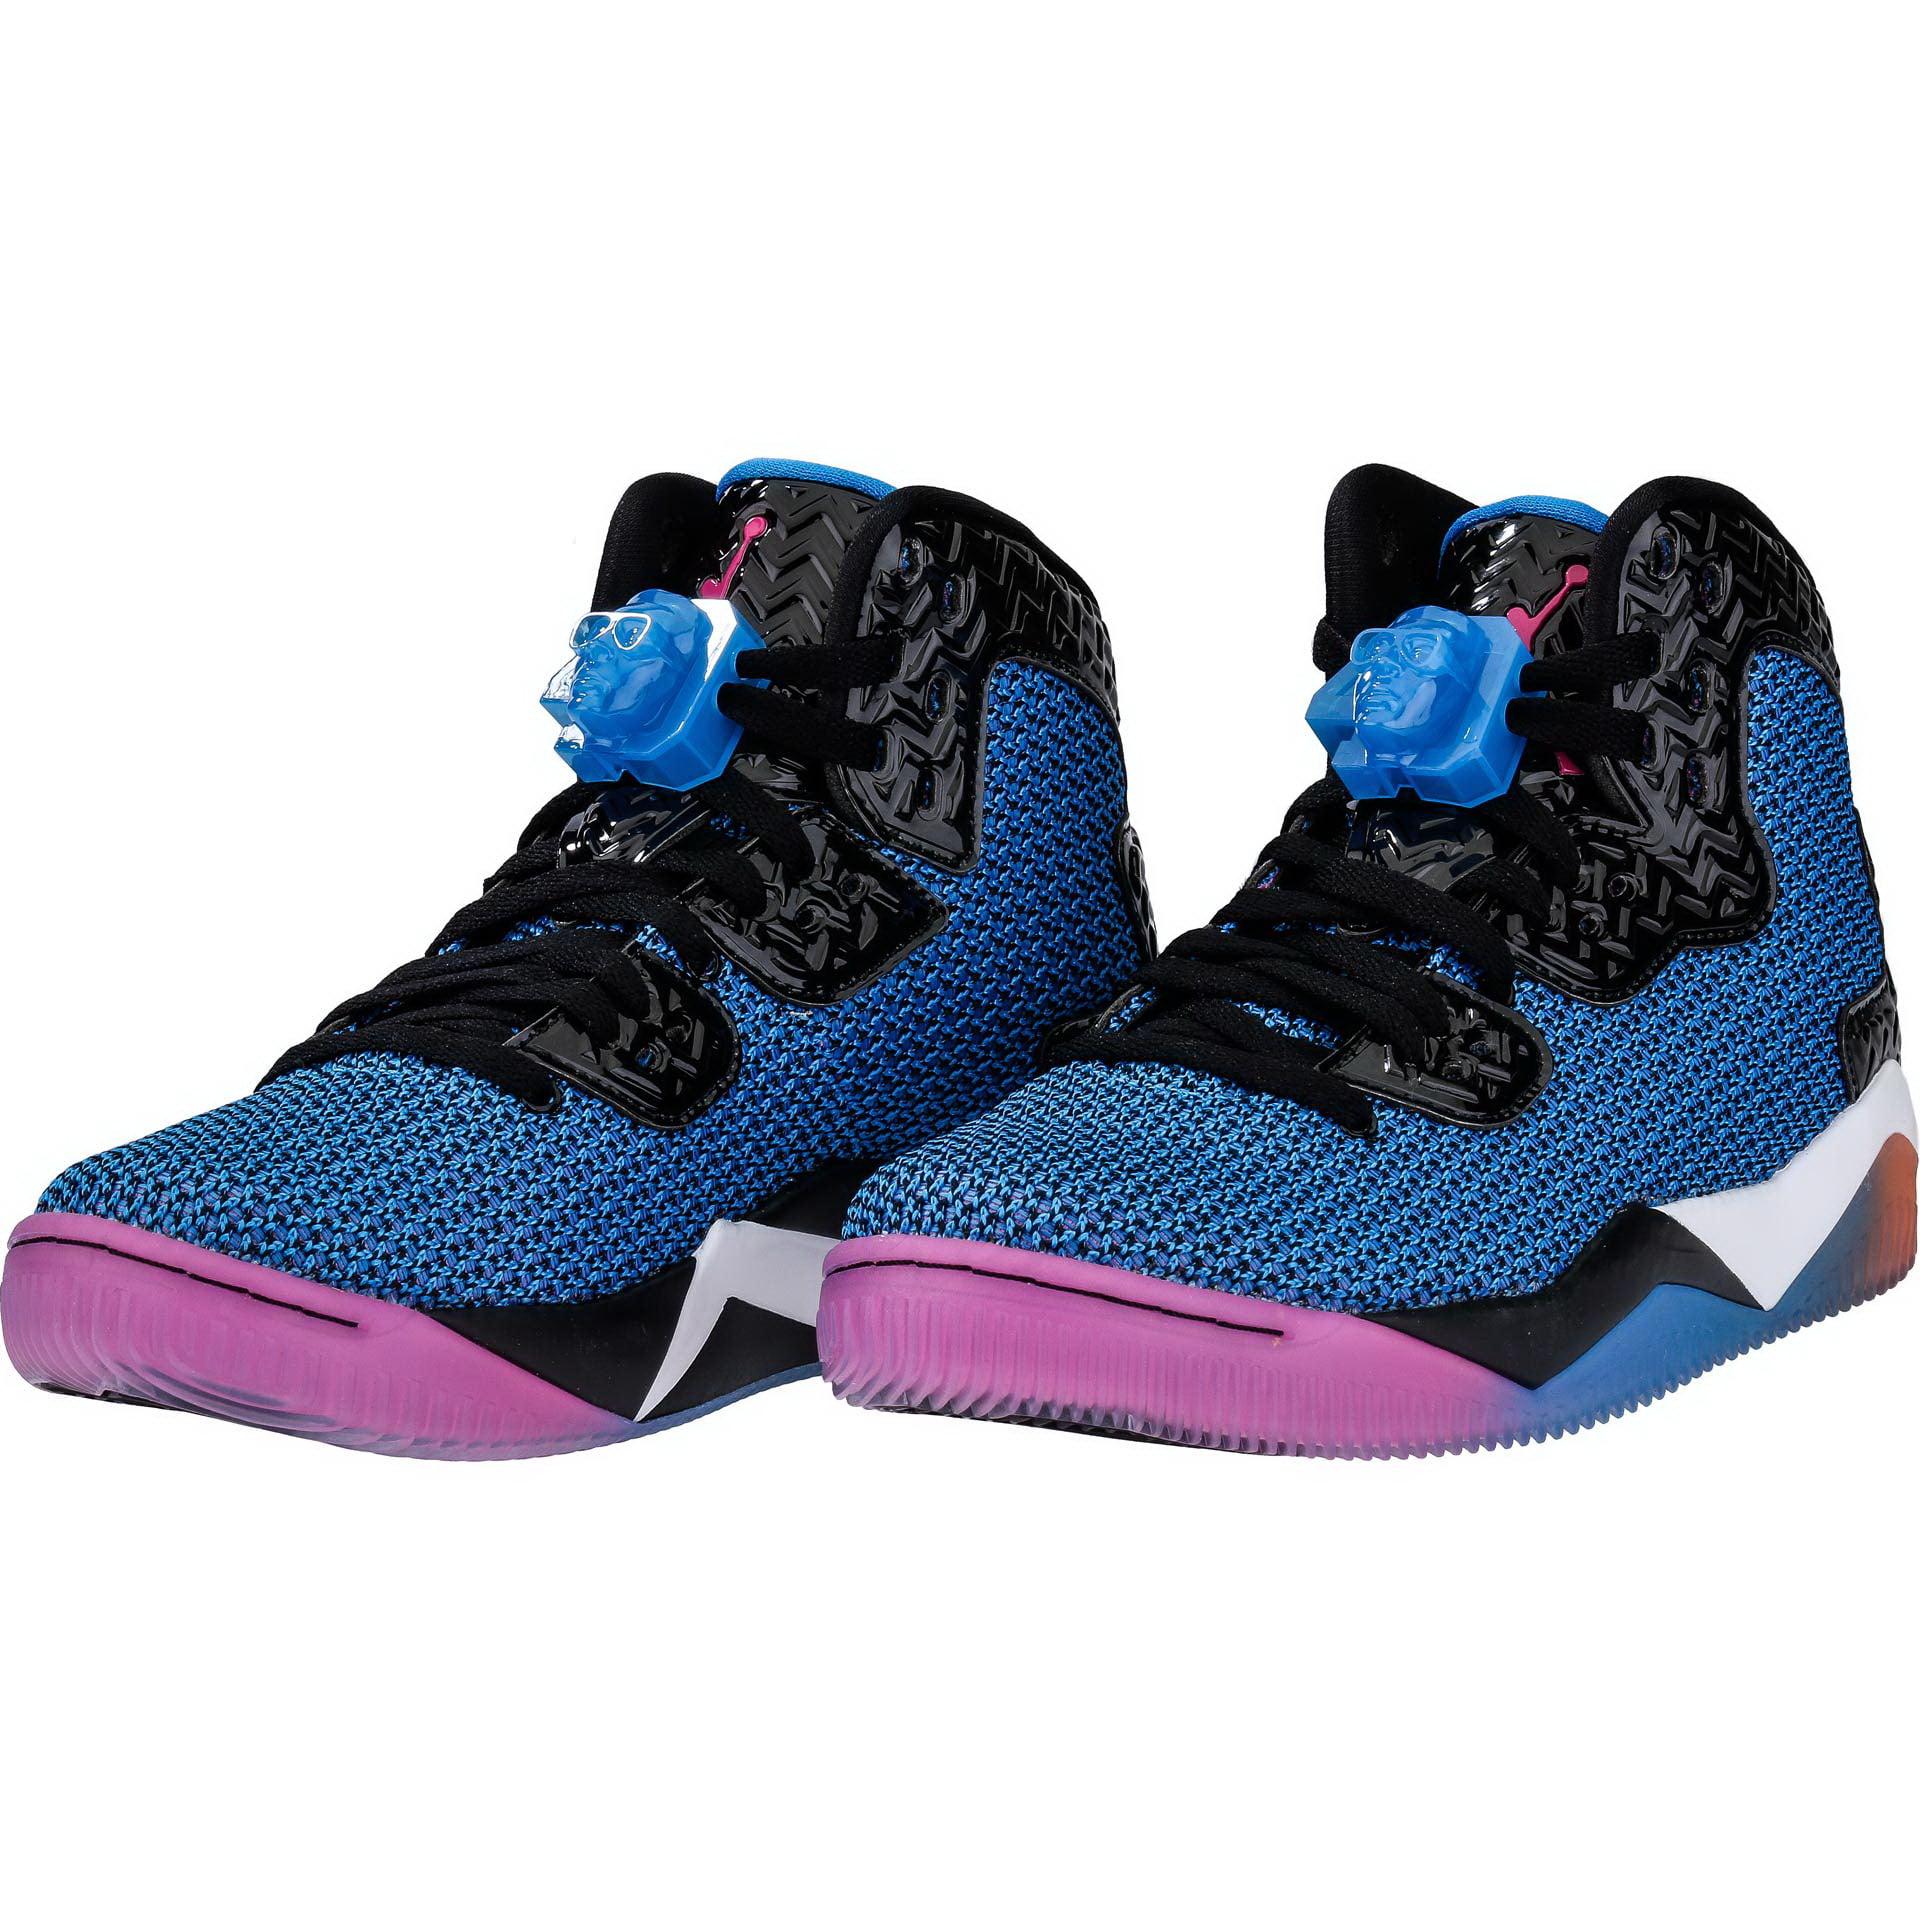 Nike Jordan Men's Air Jordan Spike Forty Bg Basketball Shoe